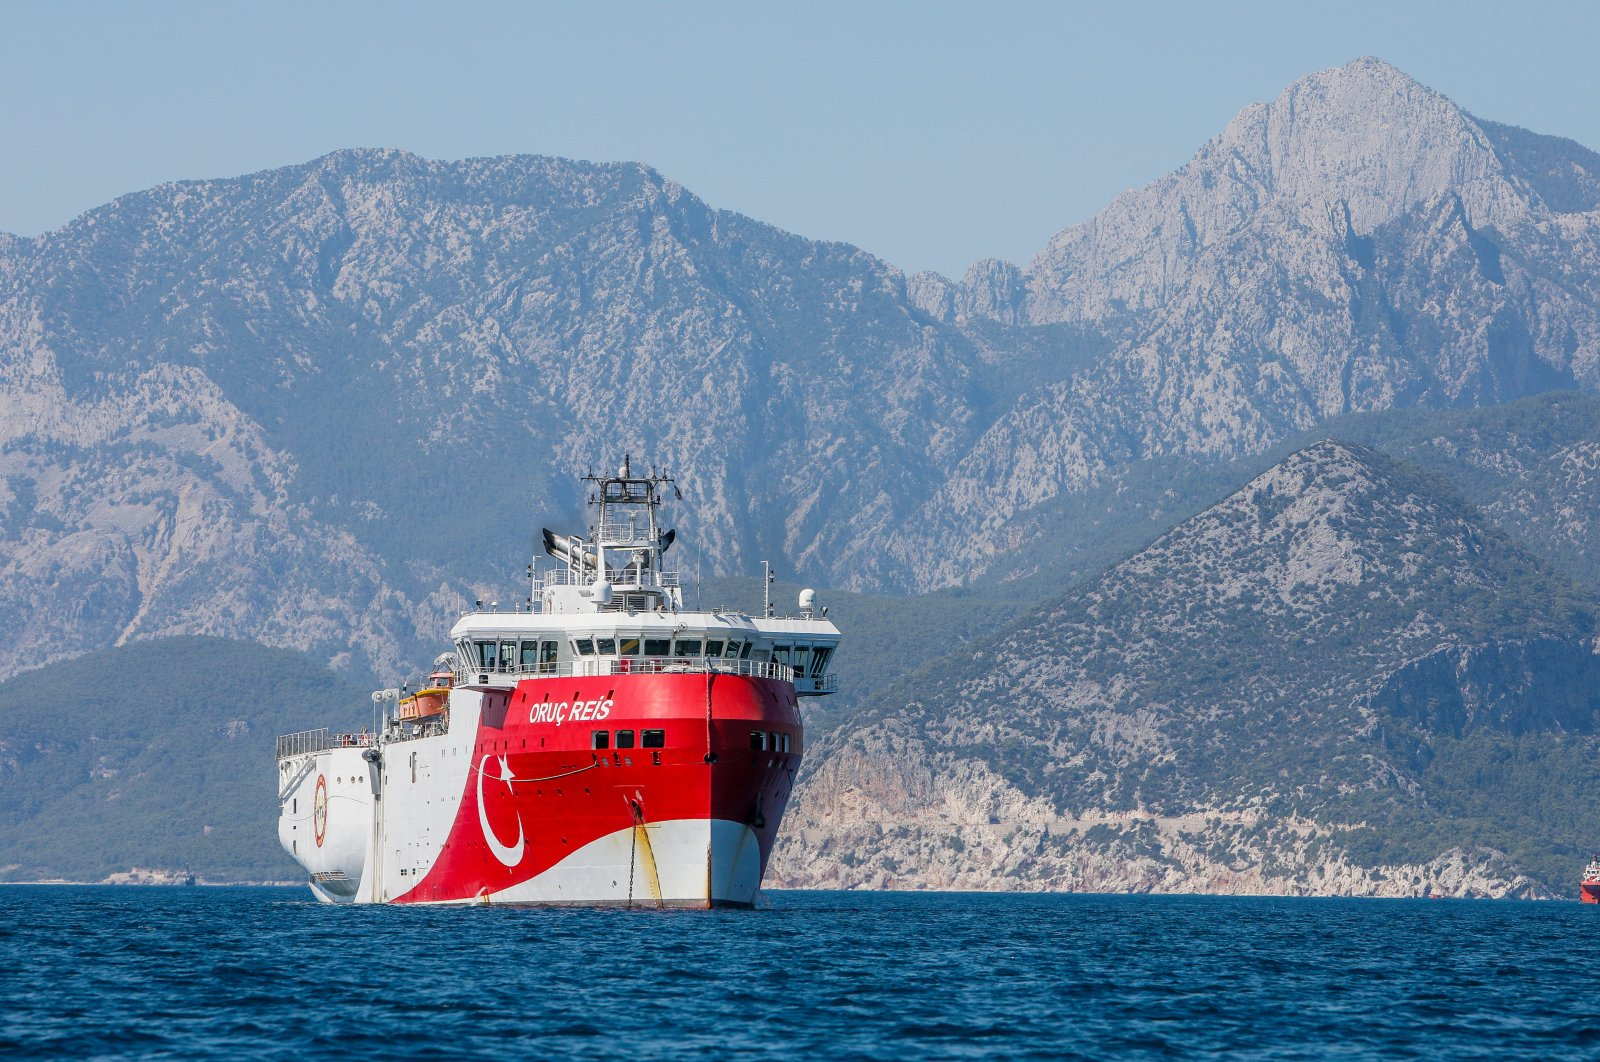 Turkey's seismic exploration vessel Oruç Reis is seen off the shore of Antalya, southern Turkey, July 23, 2020. (DHA Photo)